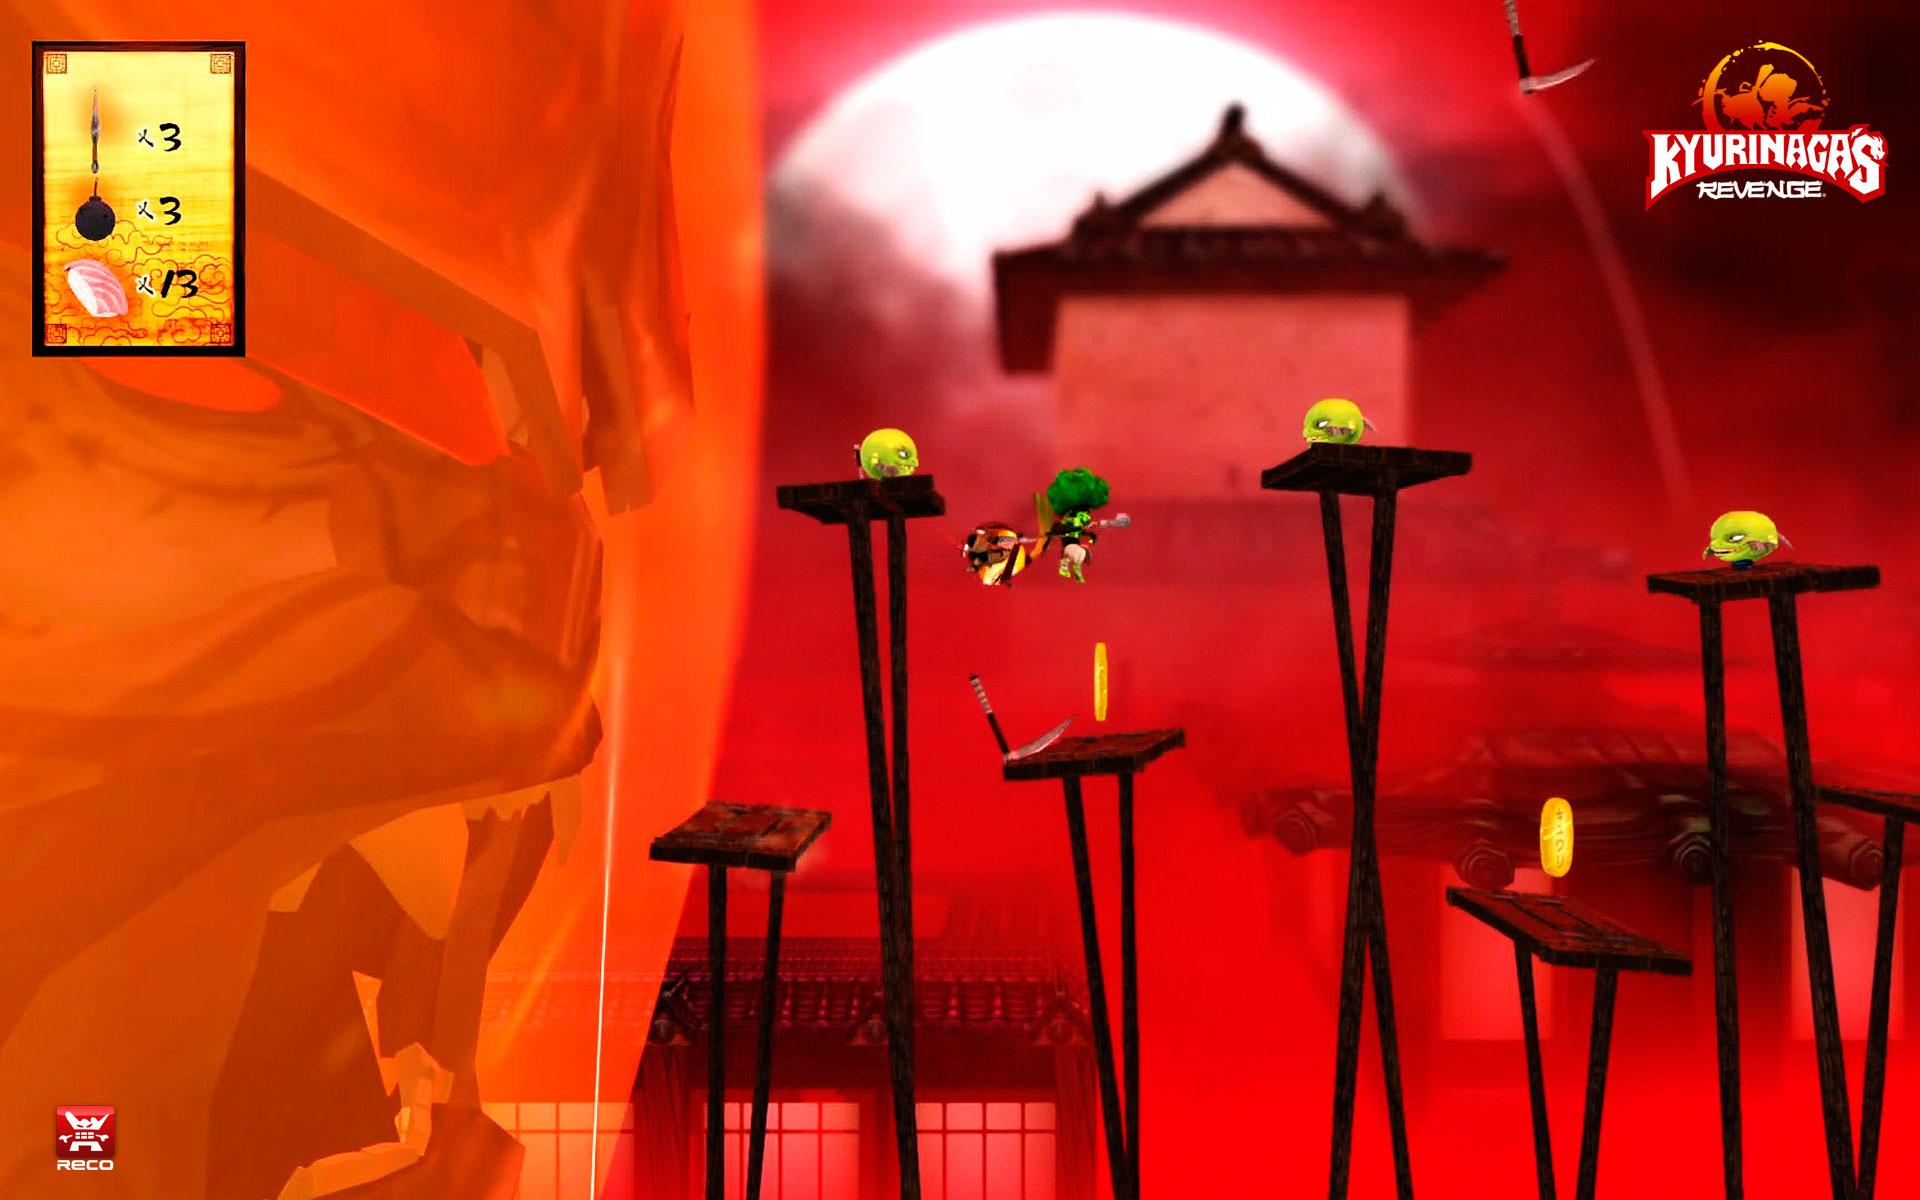 Kyurinaga's Revenge screens 3